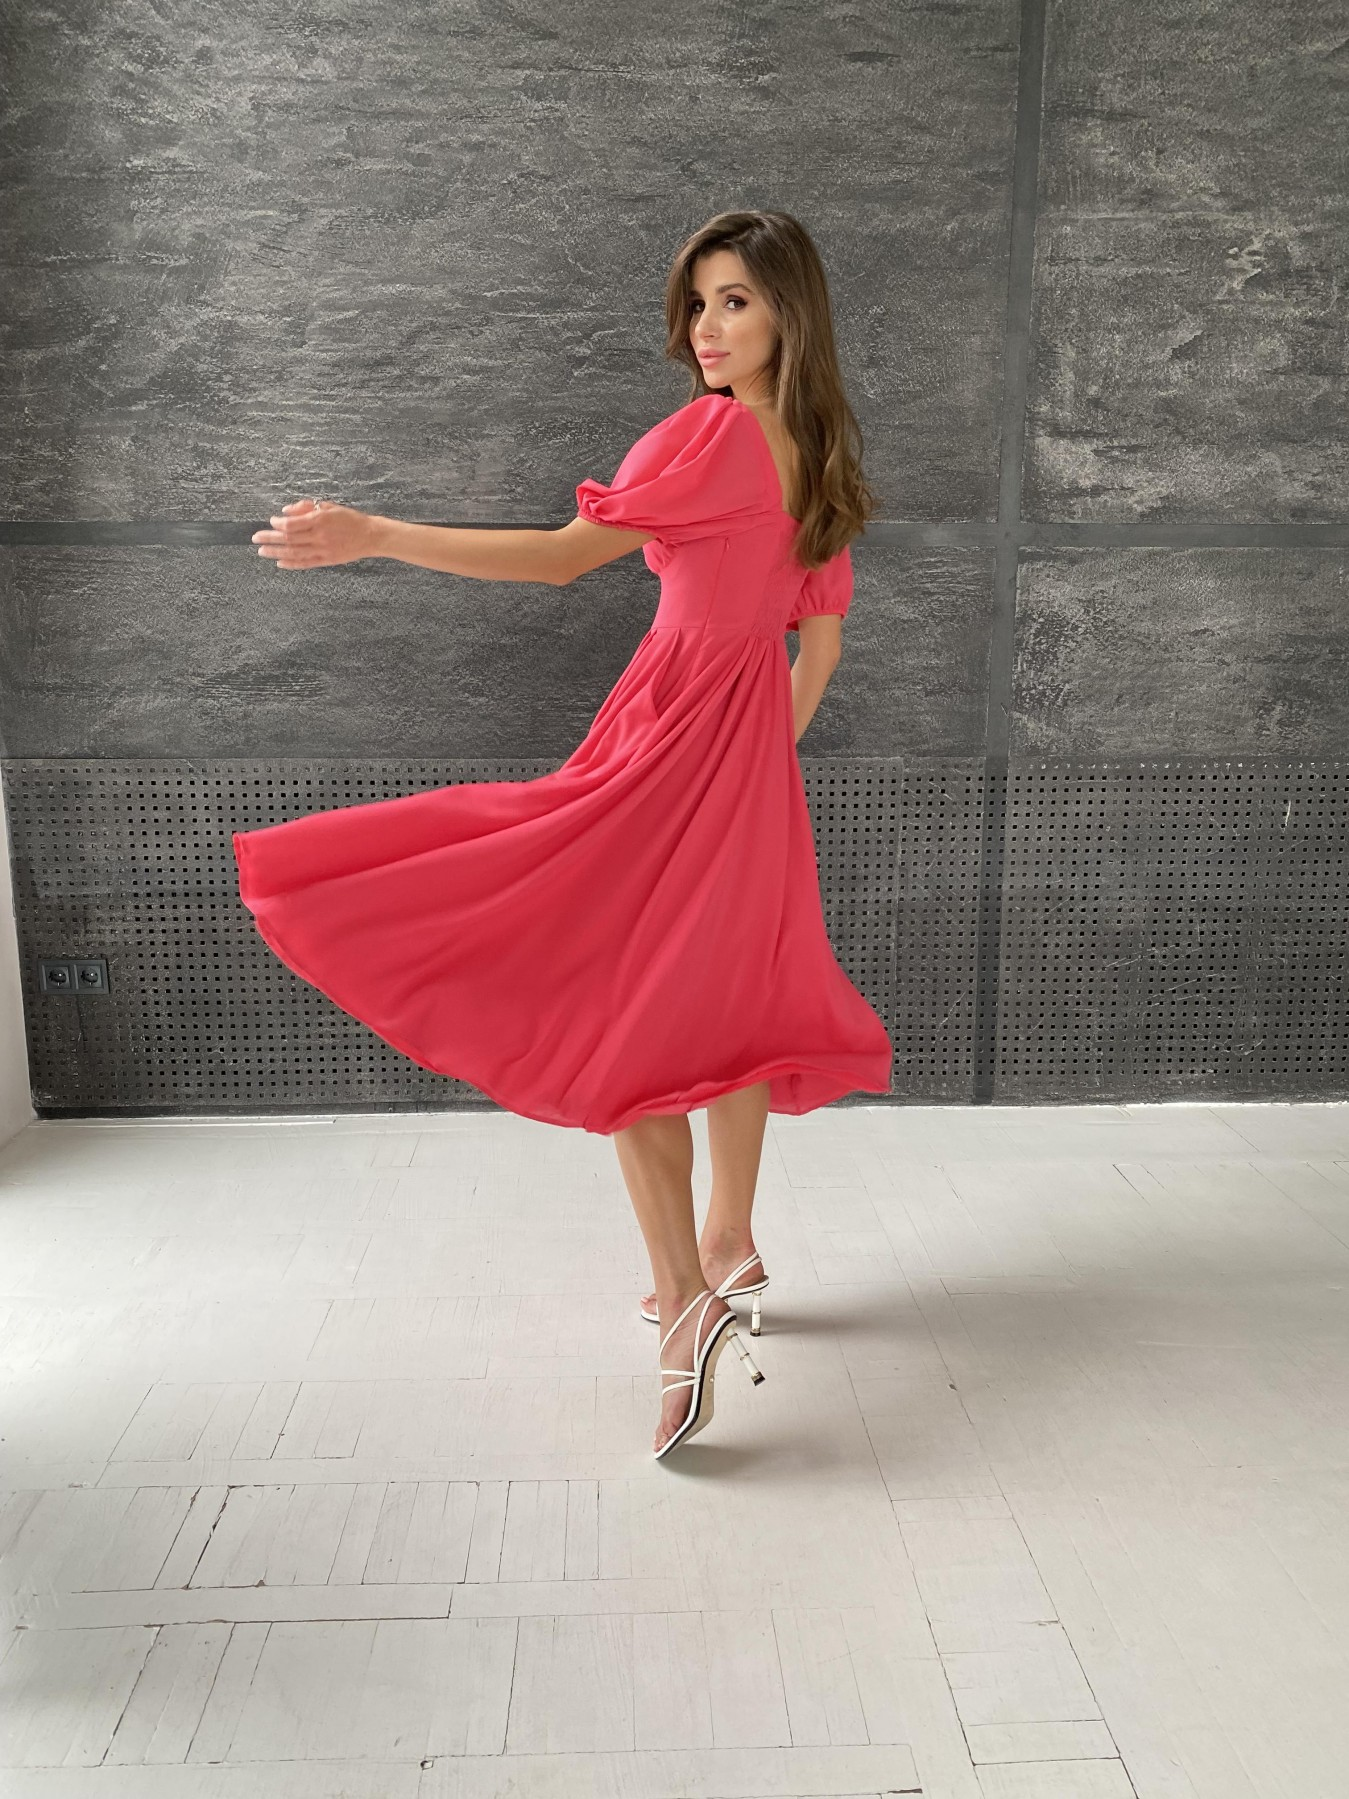 Кисес Миди платье из шифона креп 11443 АРТ. 48314 Цвет: Коралл - фото 6, интернет магазин tm-modus.ru